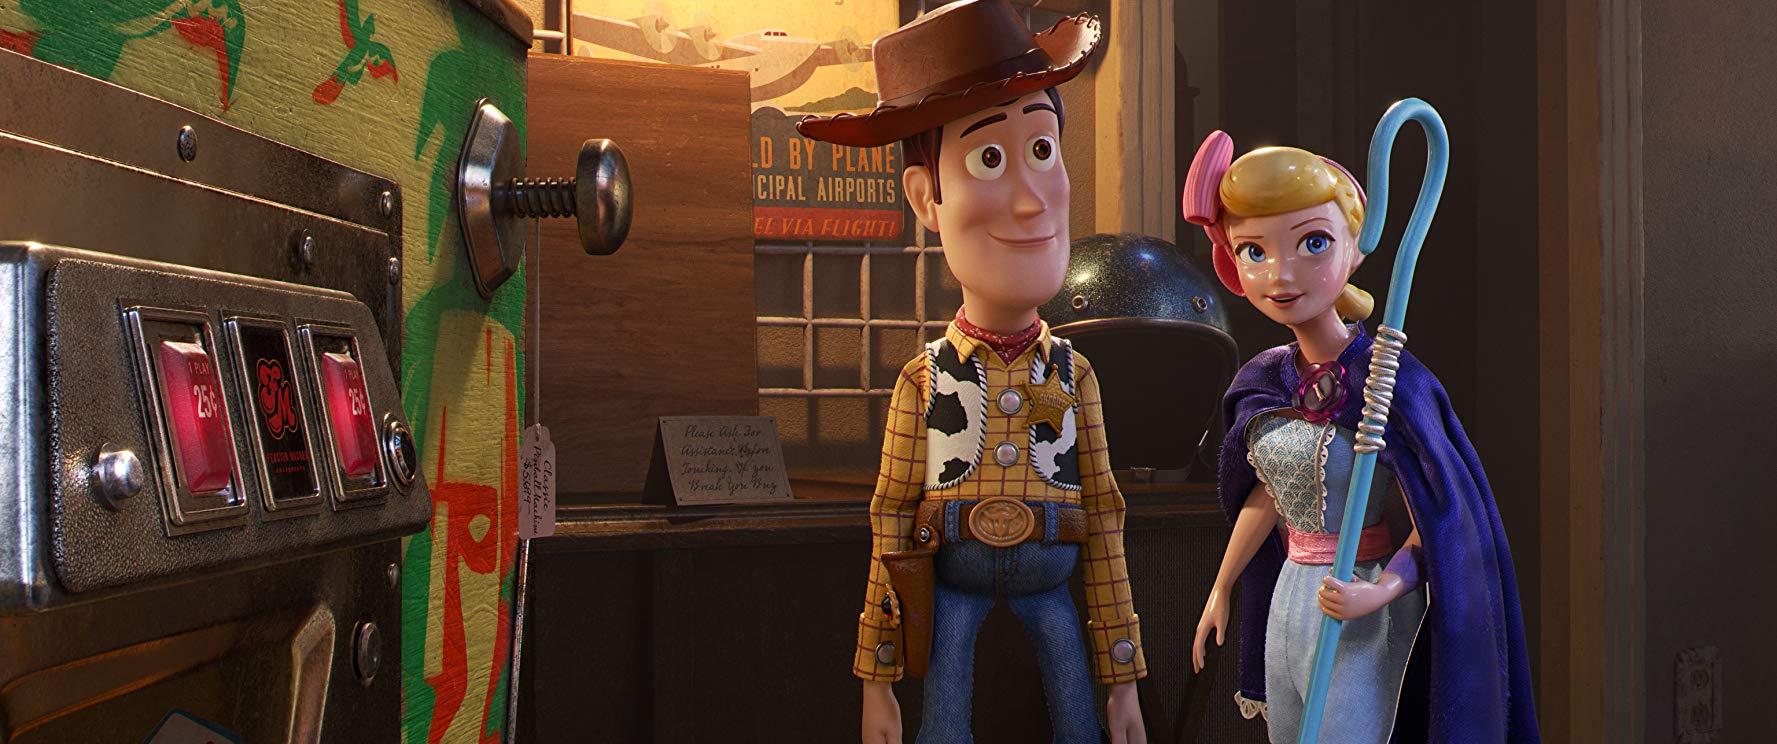 Toy-Story-4a.jpg